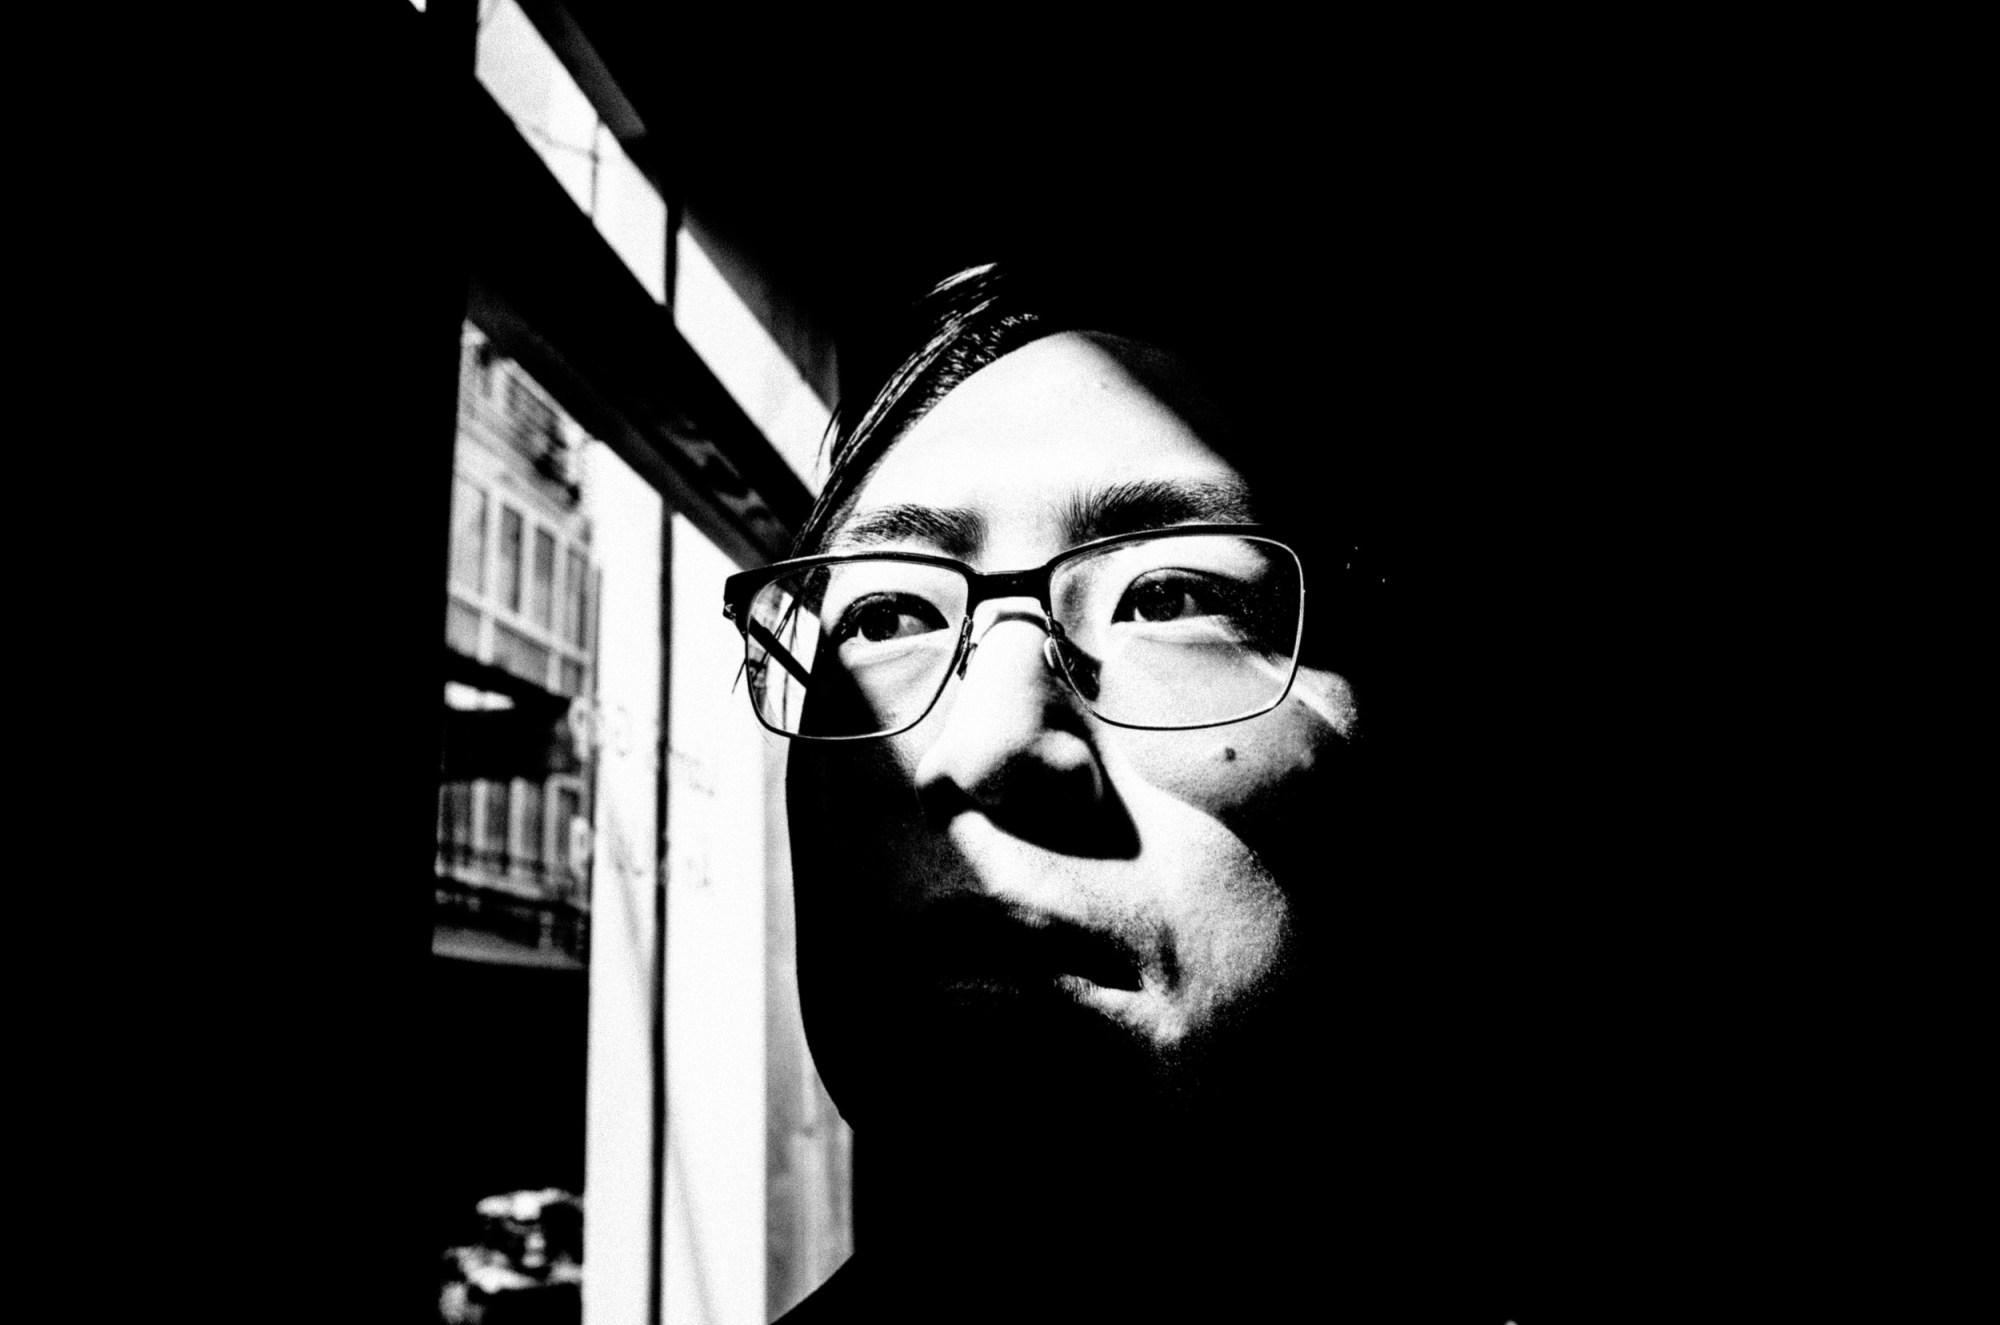 Selfie by CINDY NGUYEN